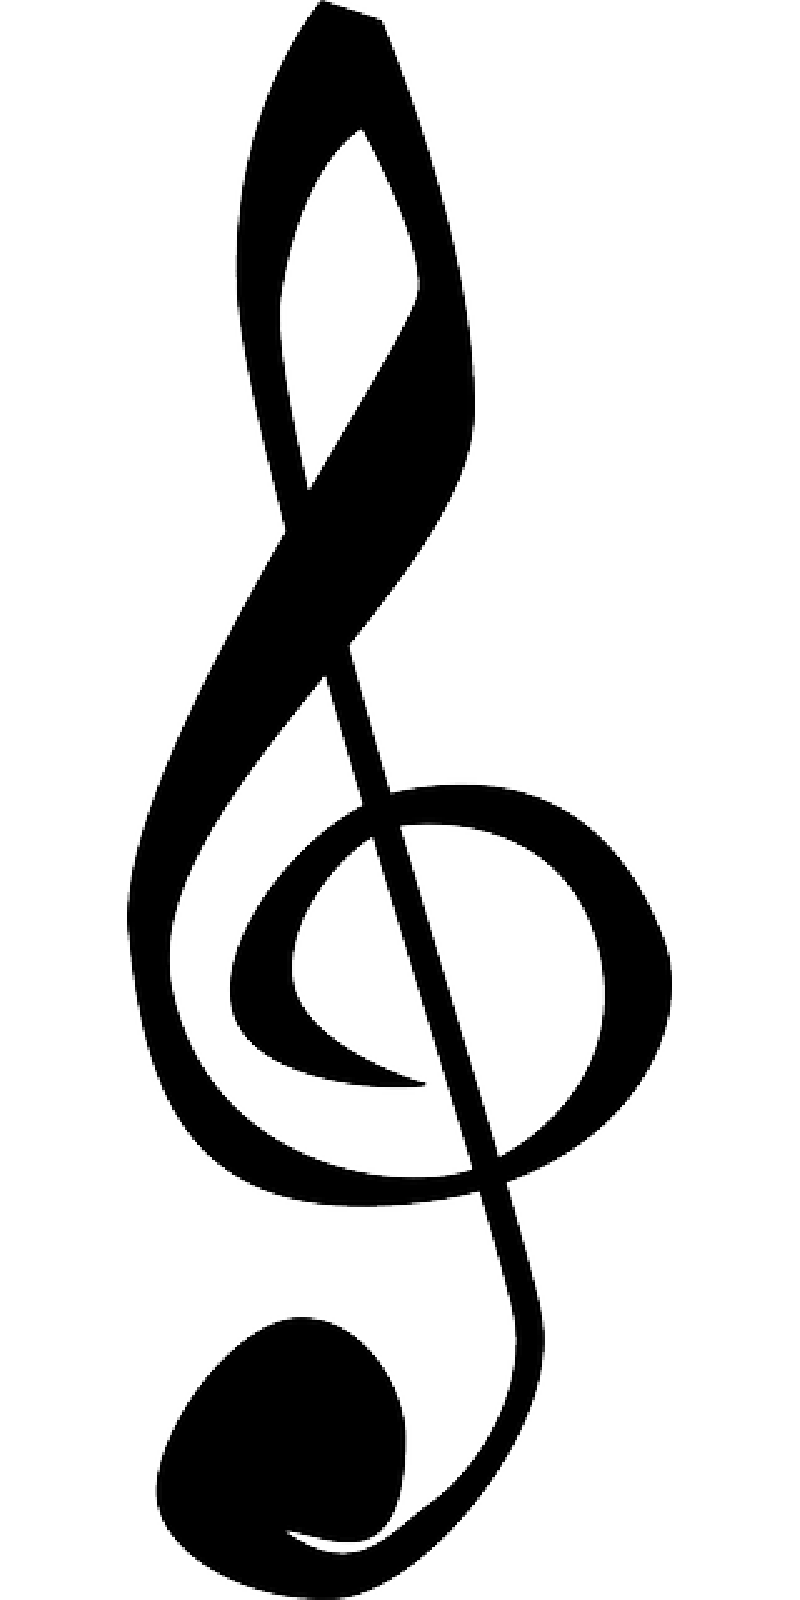 Music Notes Symbols Clip Art